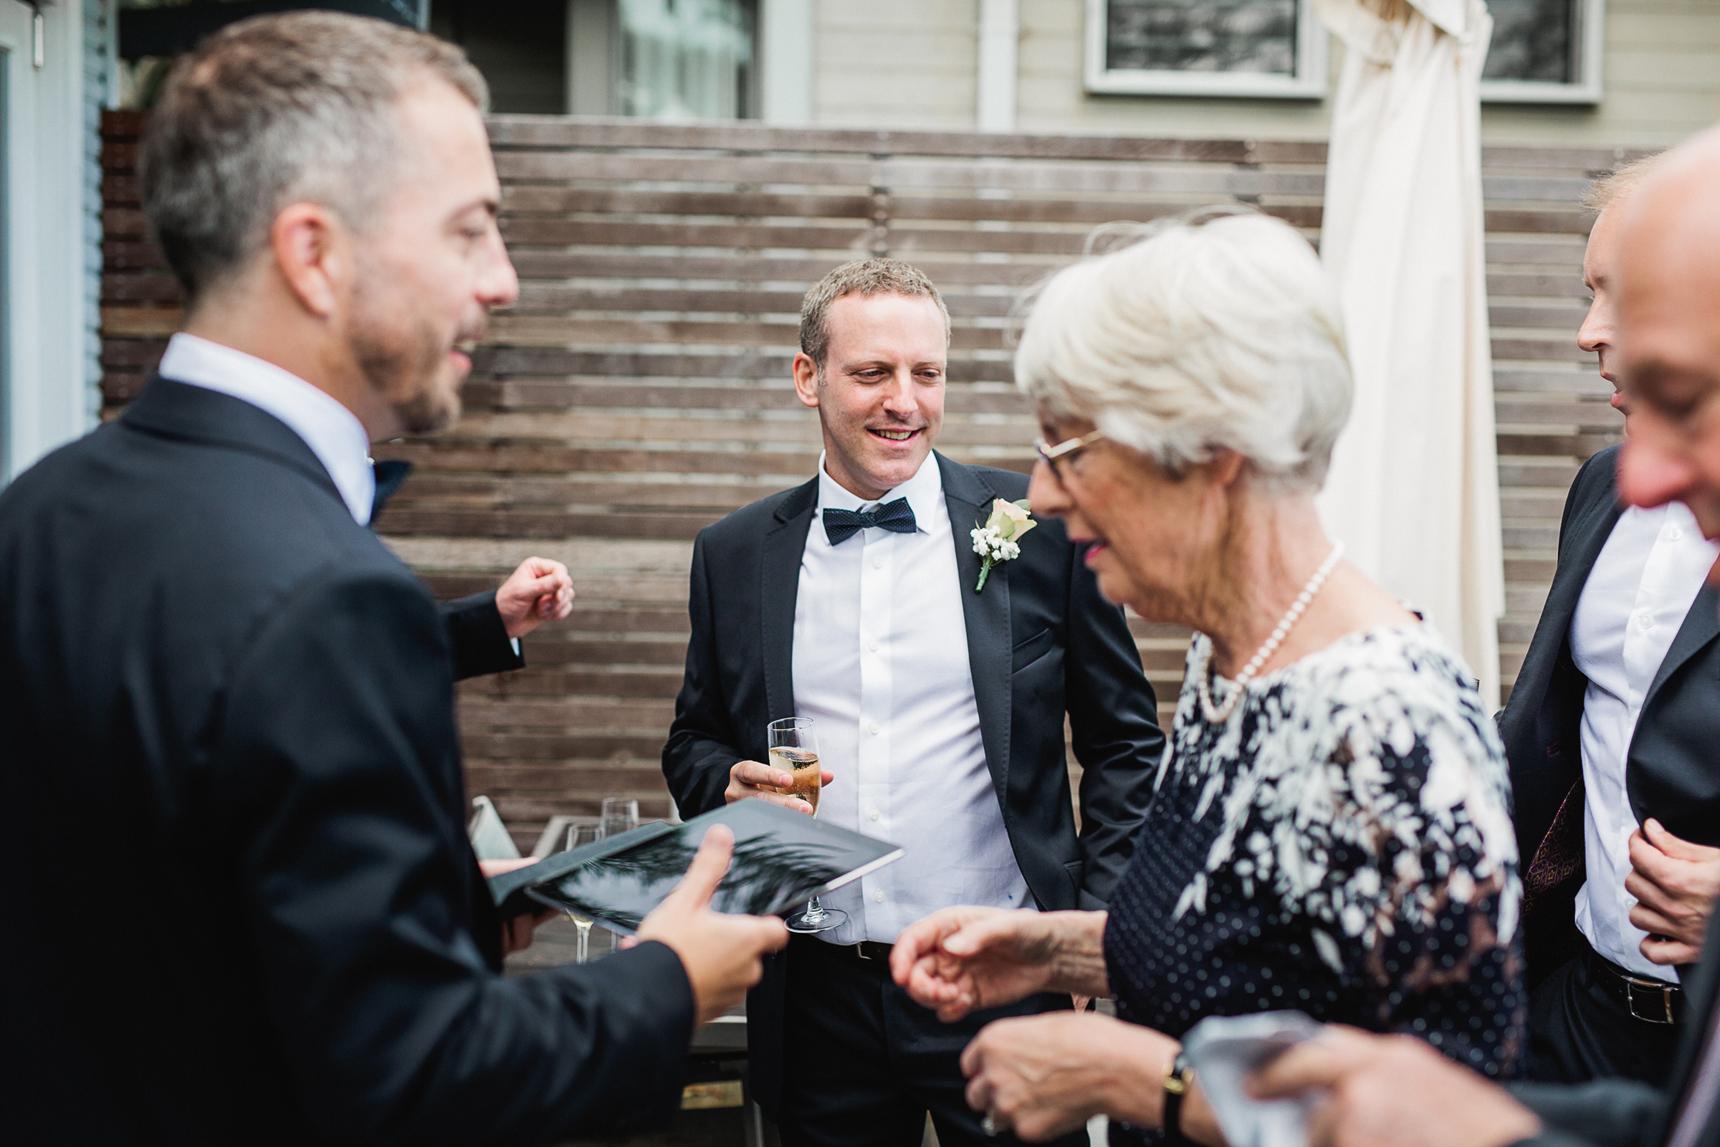 AngeRuss_MobyDicks_WhaleBeach_Wedding_Photography013.jpg